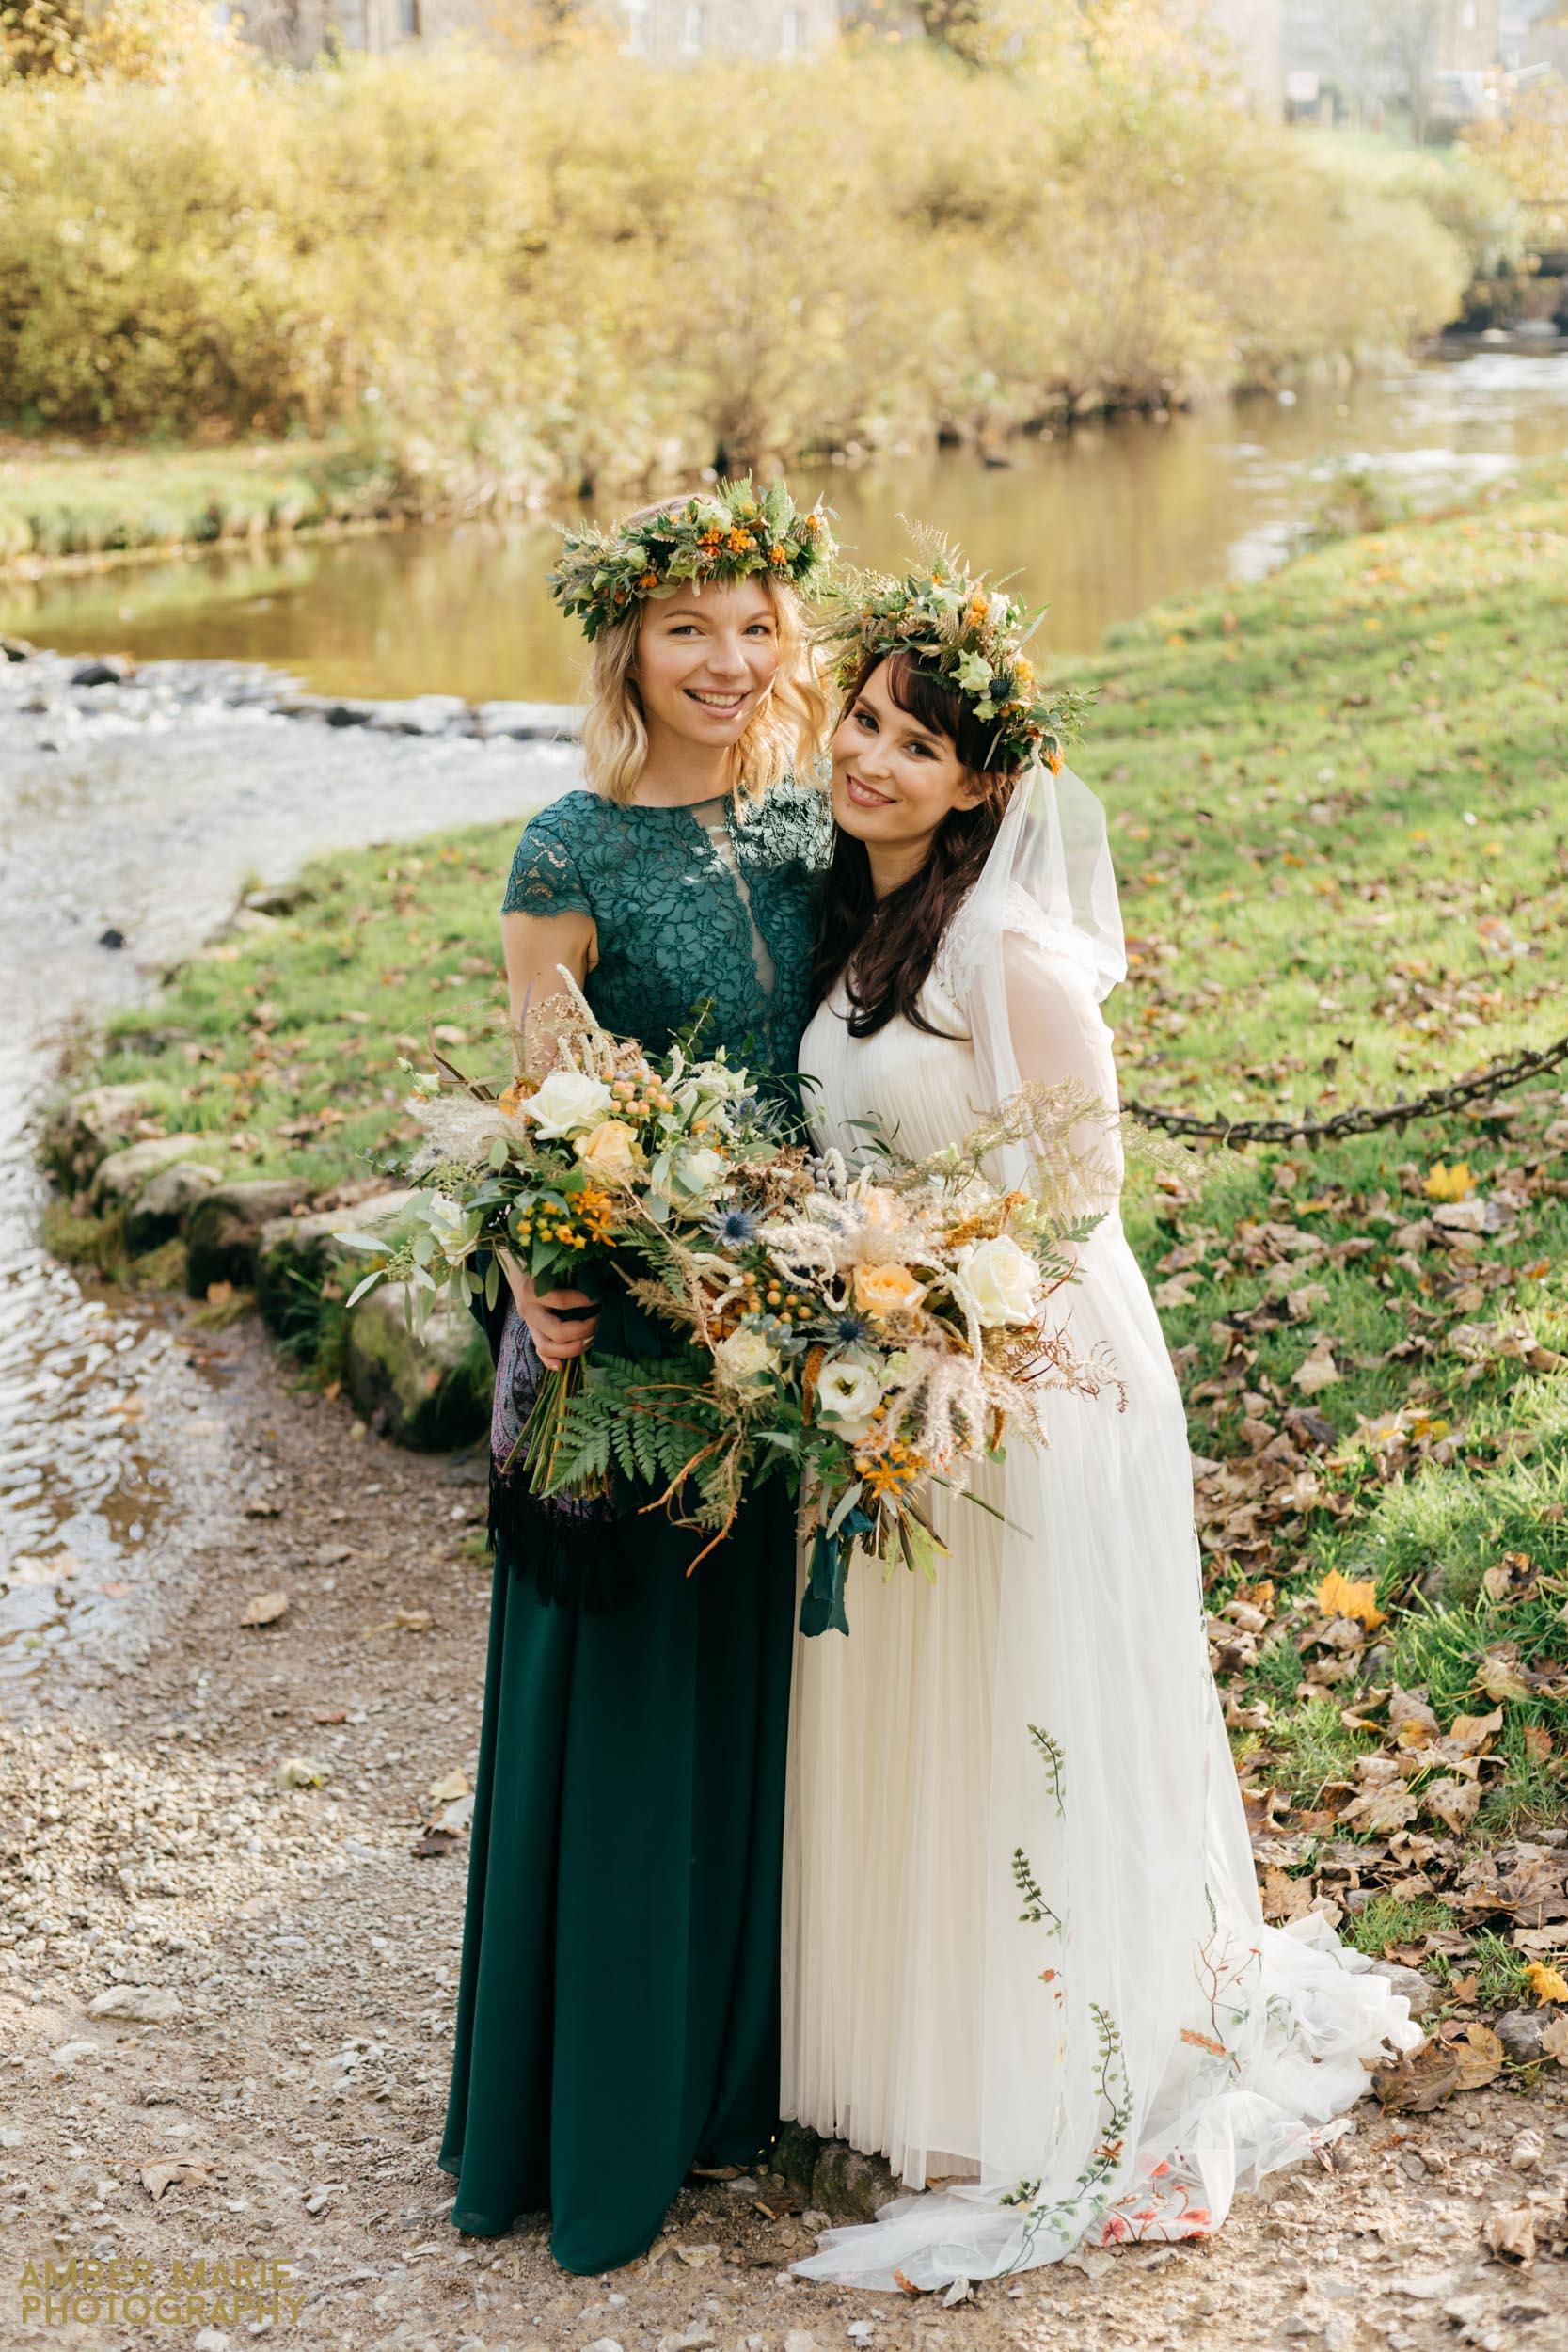 Stylish Halloween Wedding at Cruck Barn Yorkshire